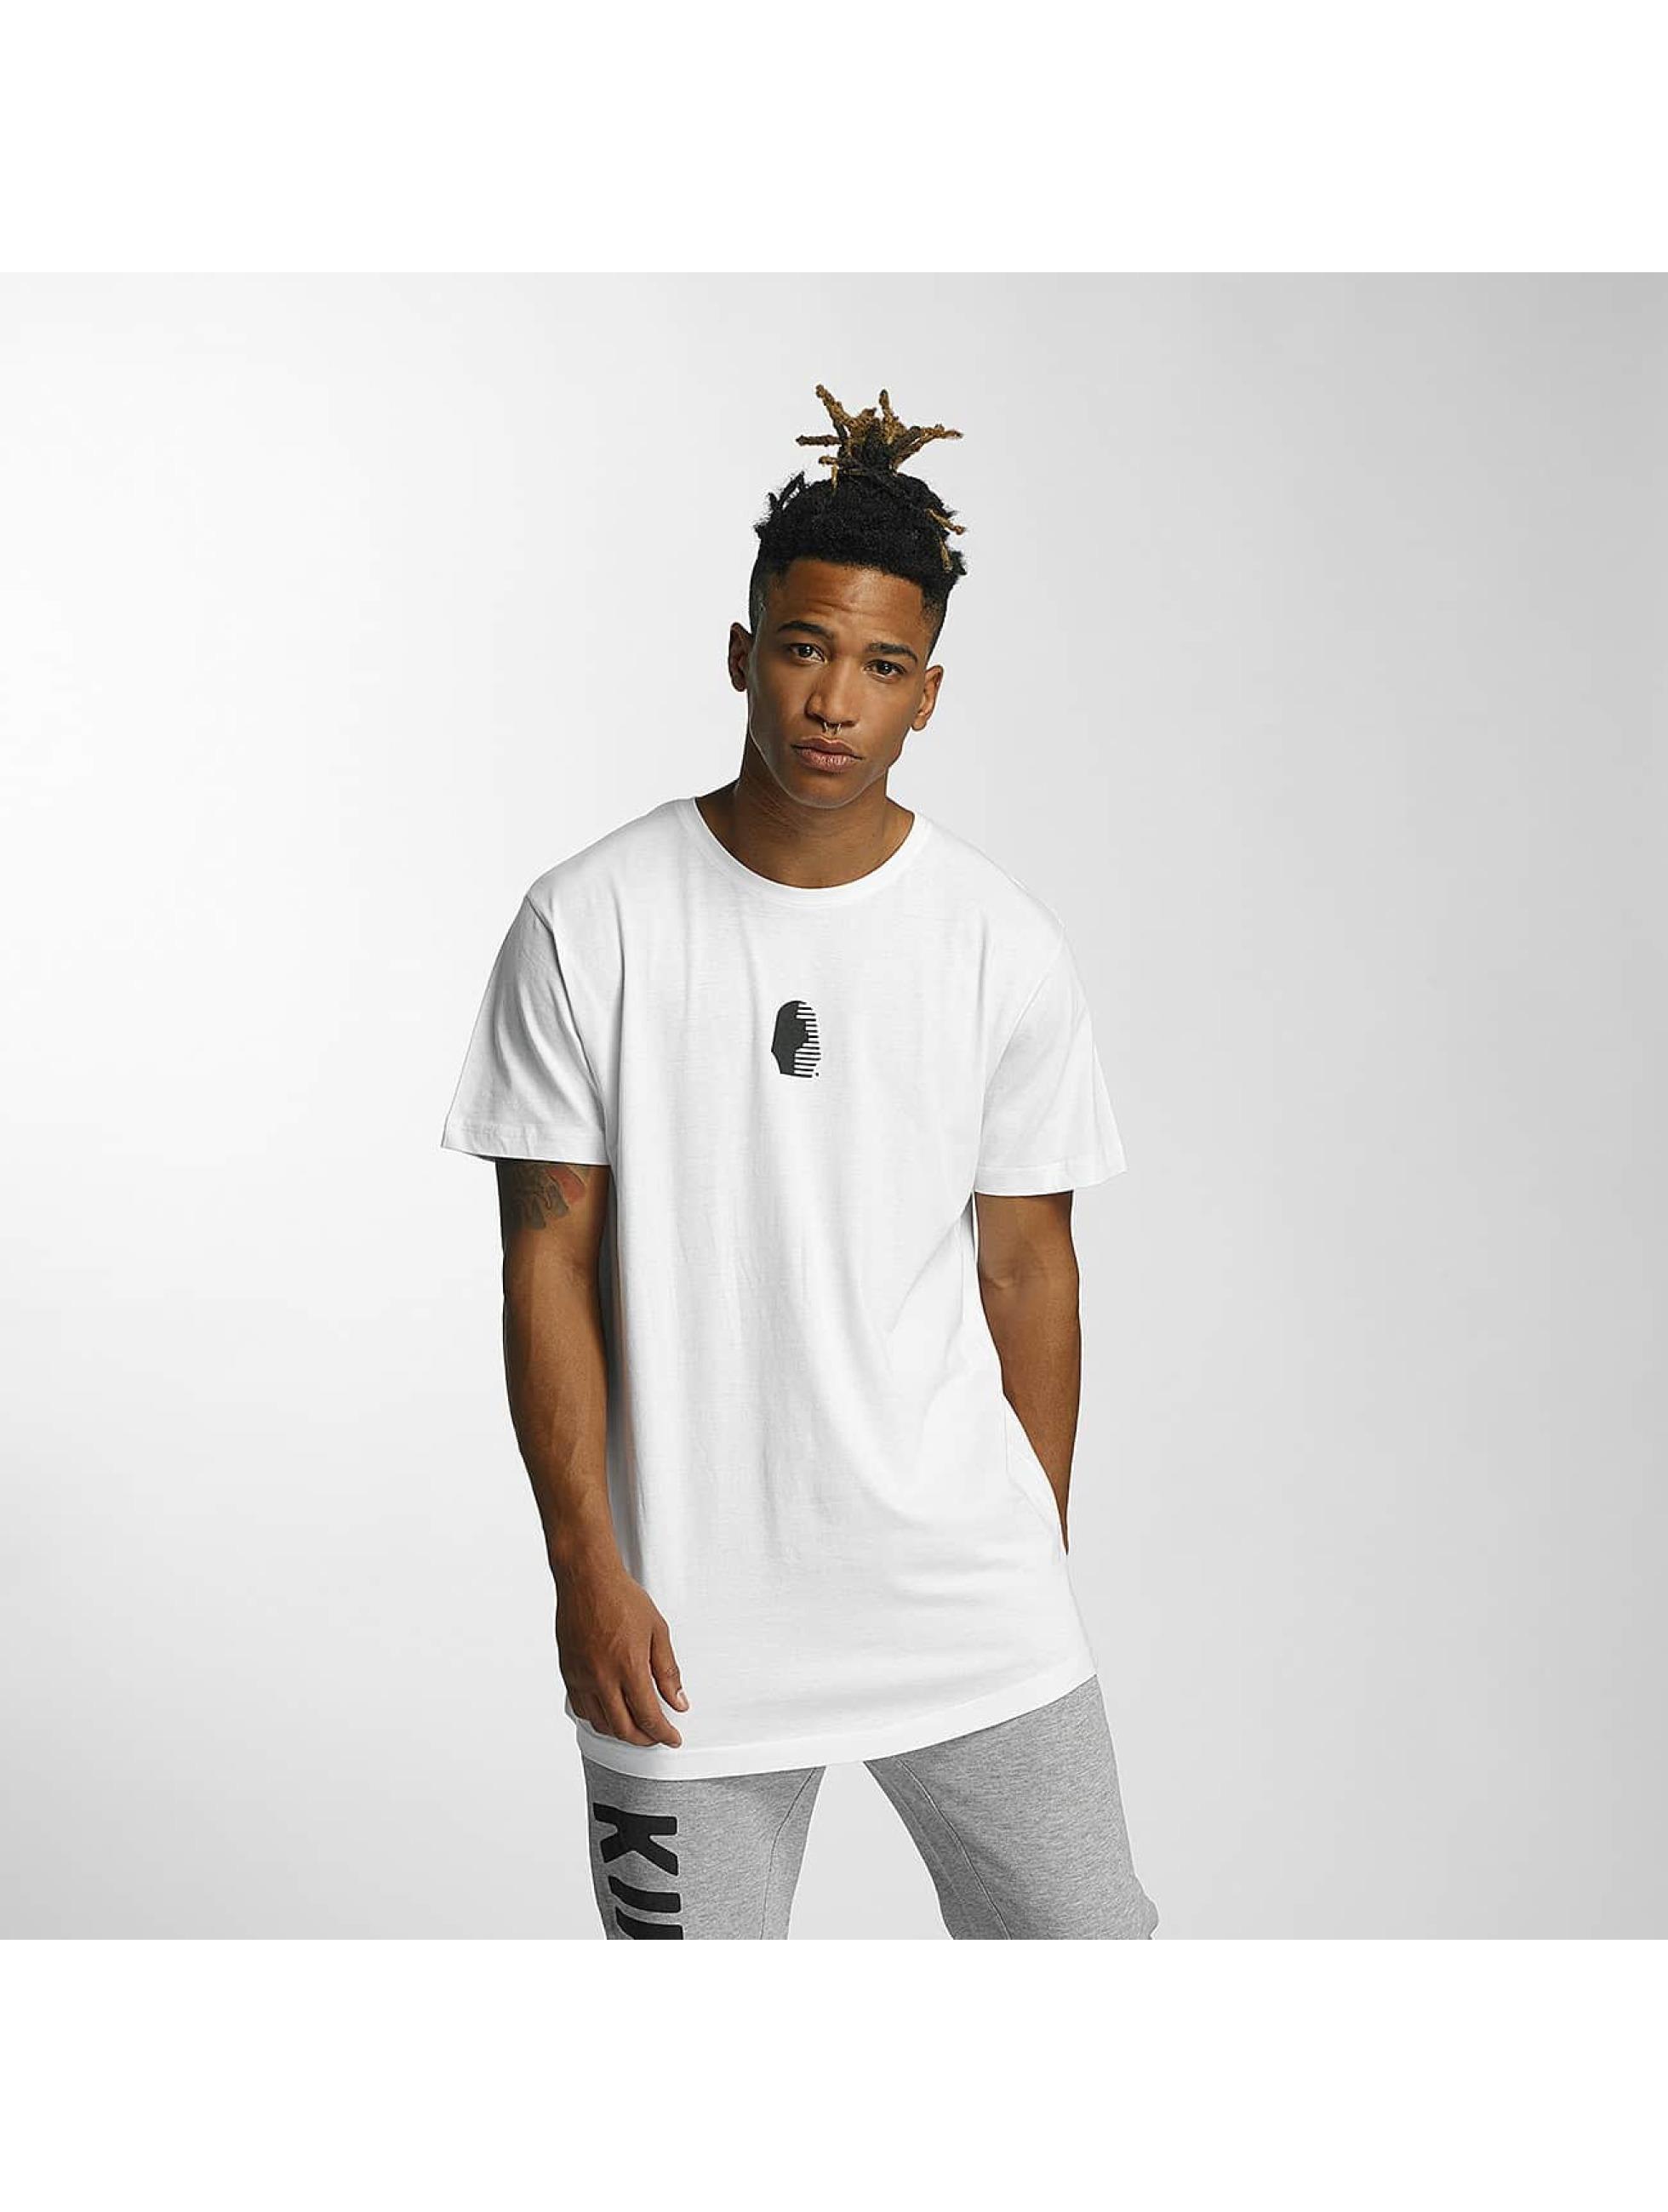 Kingin T-skjorter Comp. hvit